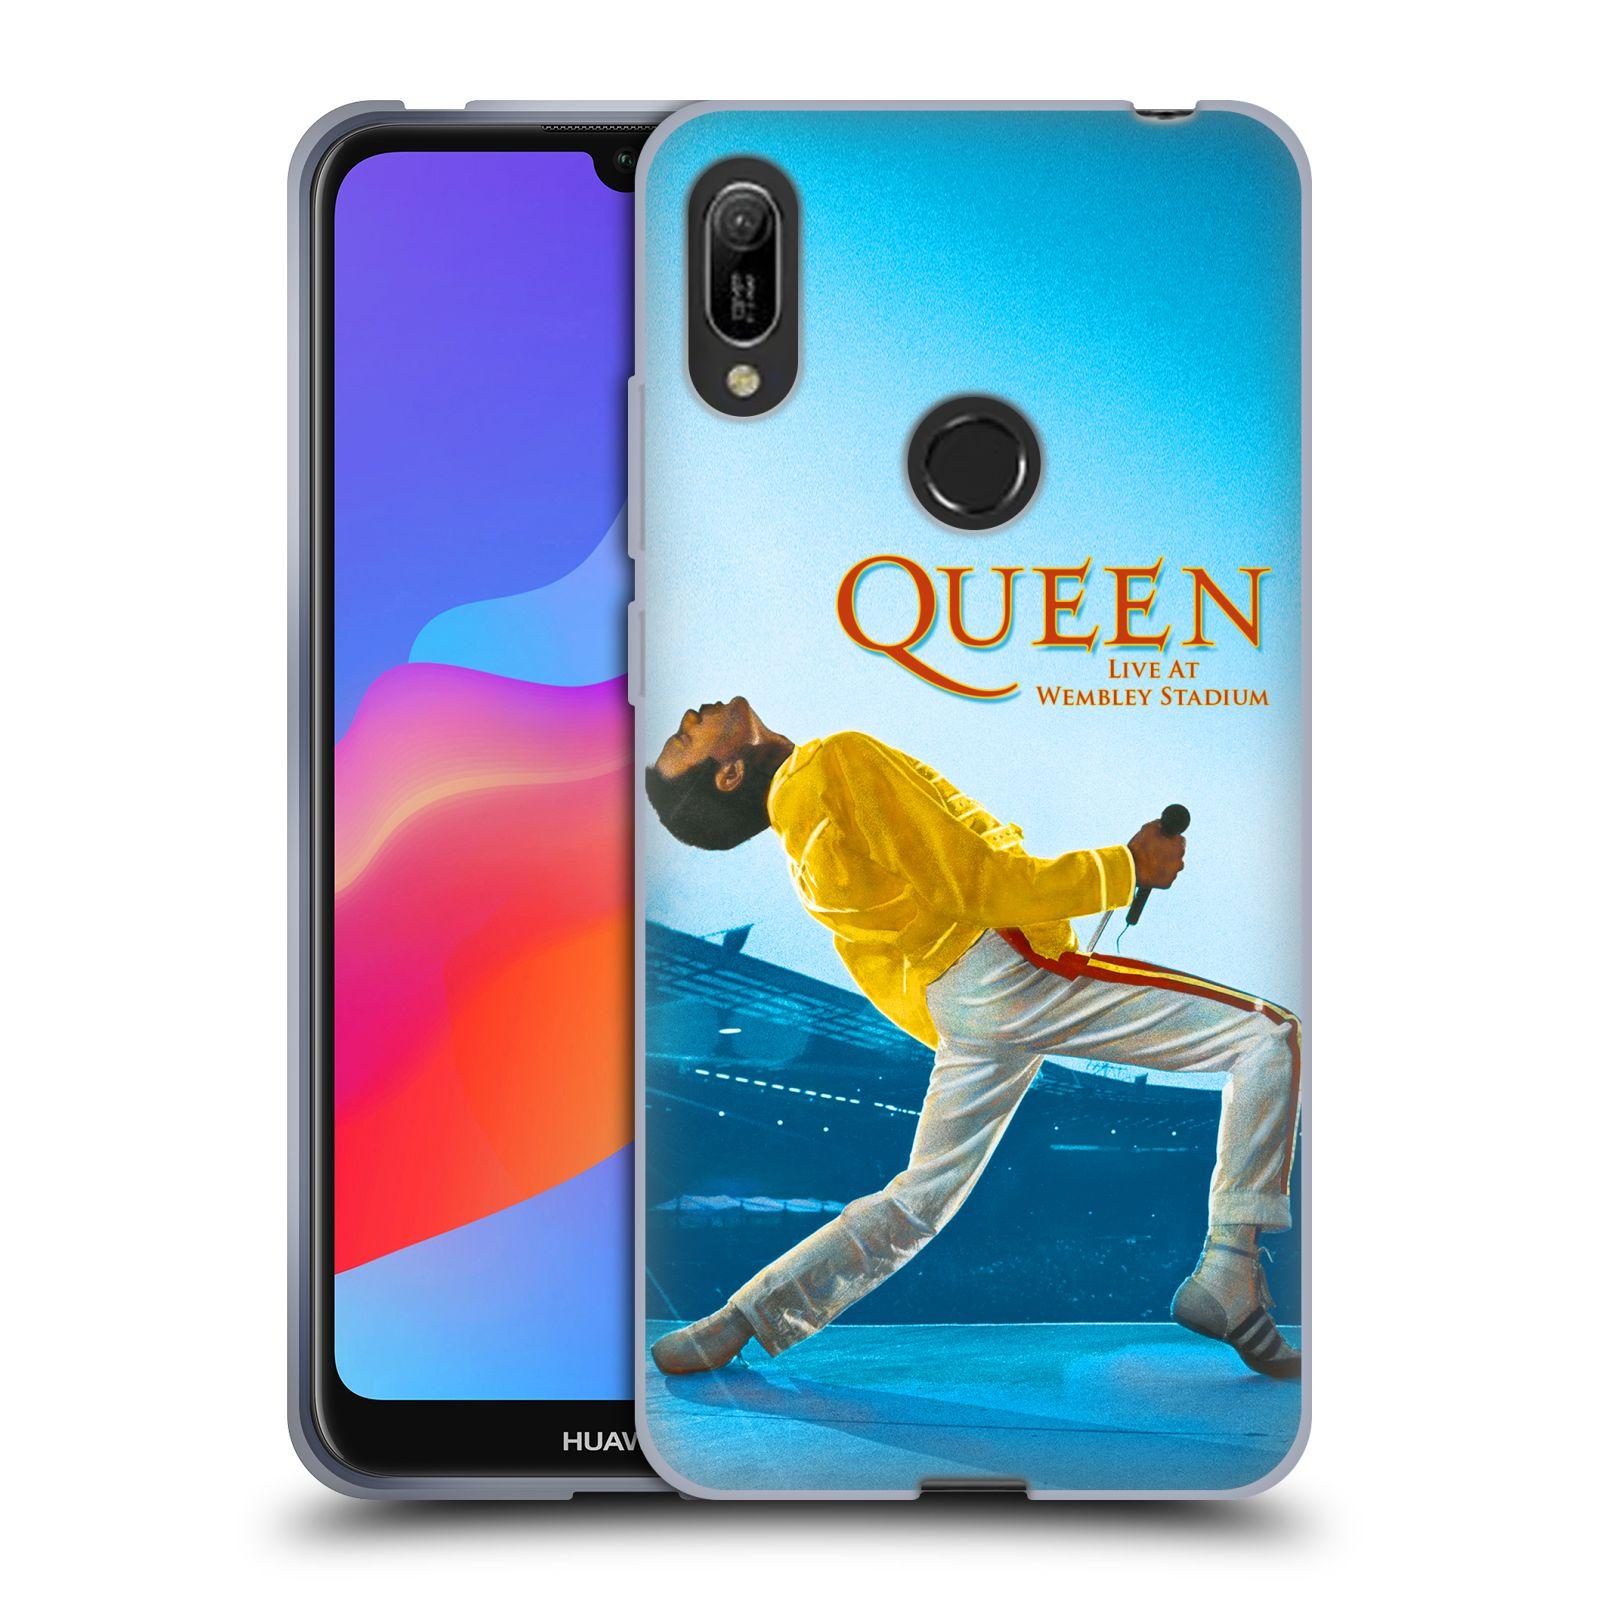 Silikonové pouzdro na mobil Huawei Y6 (2019) - Head Case - Queen - Freddie Mercury